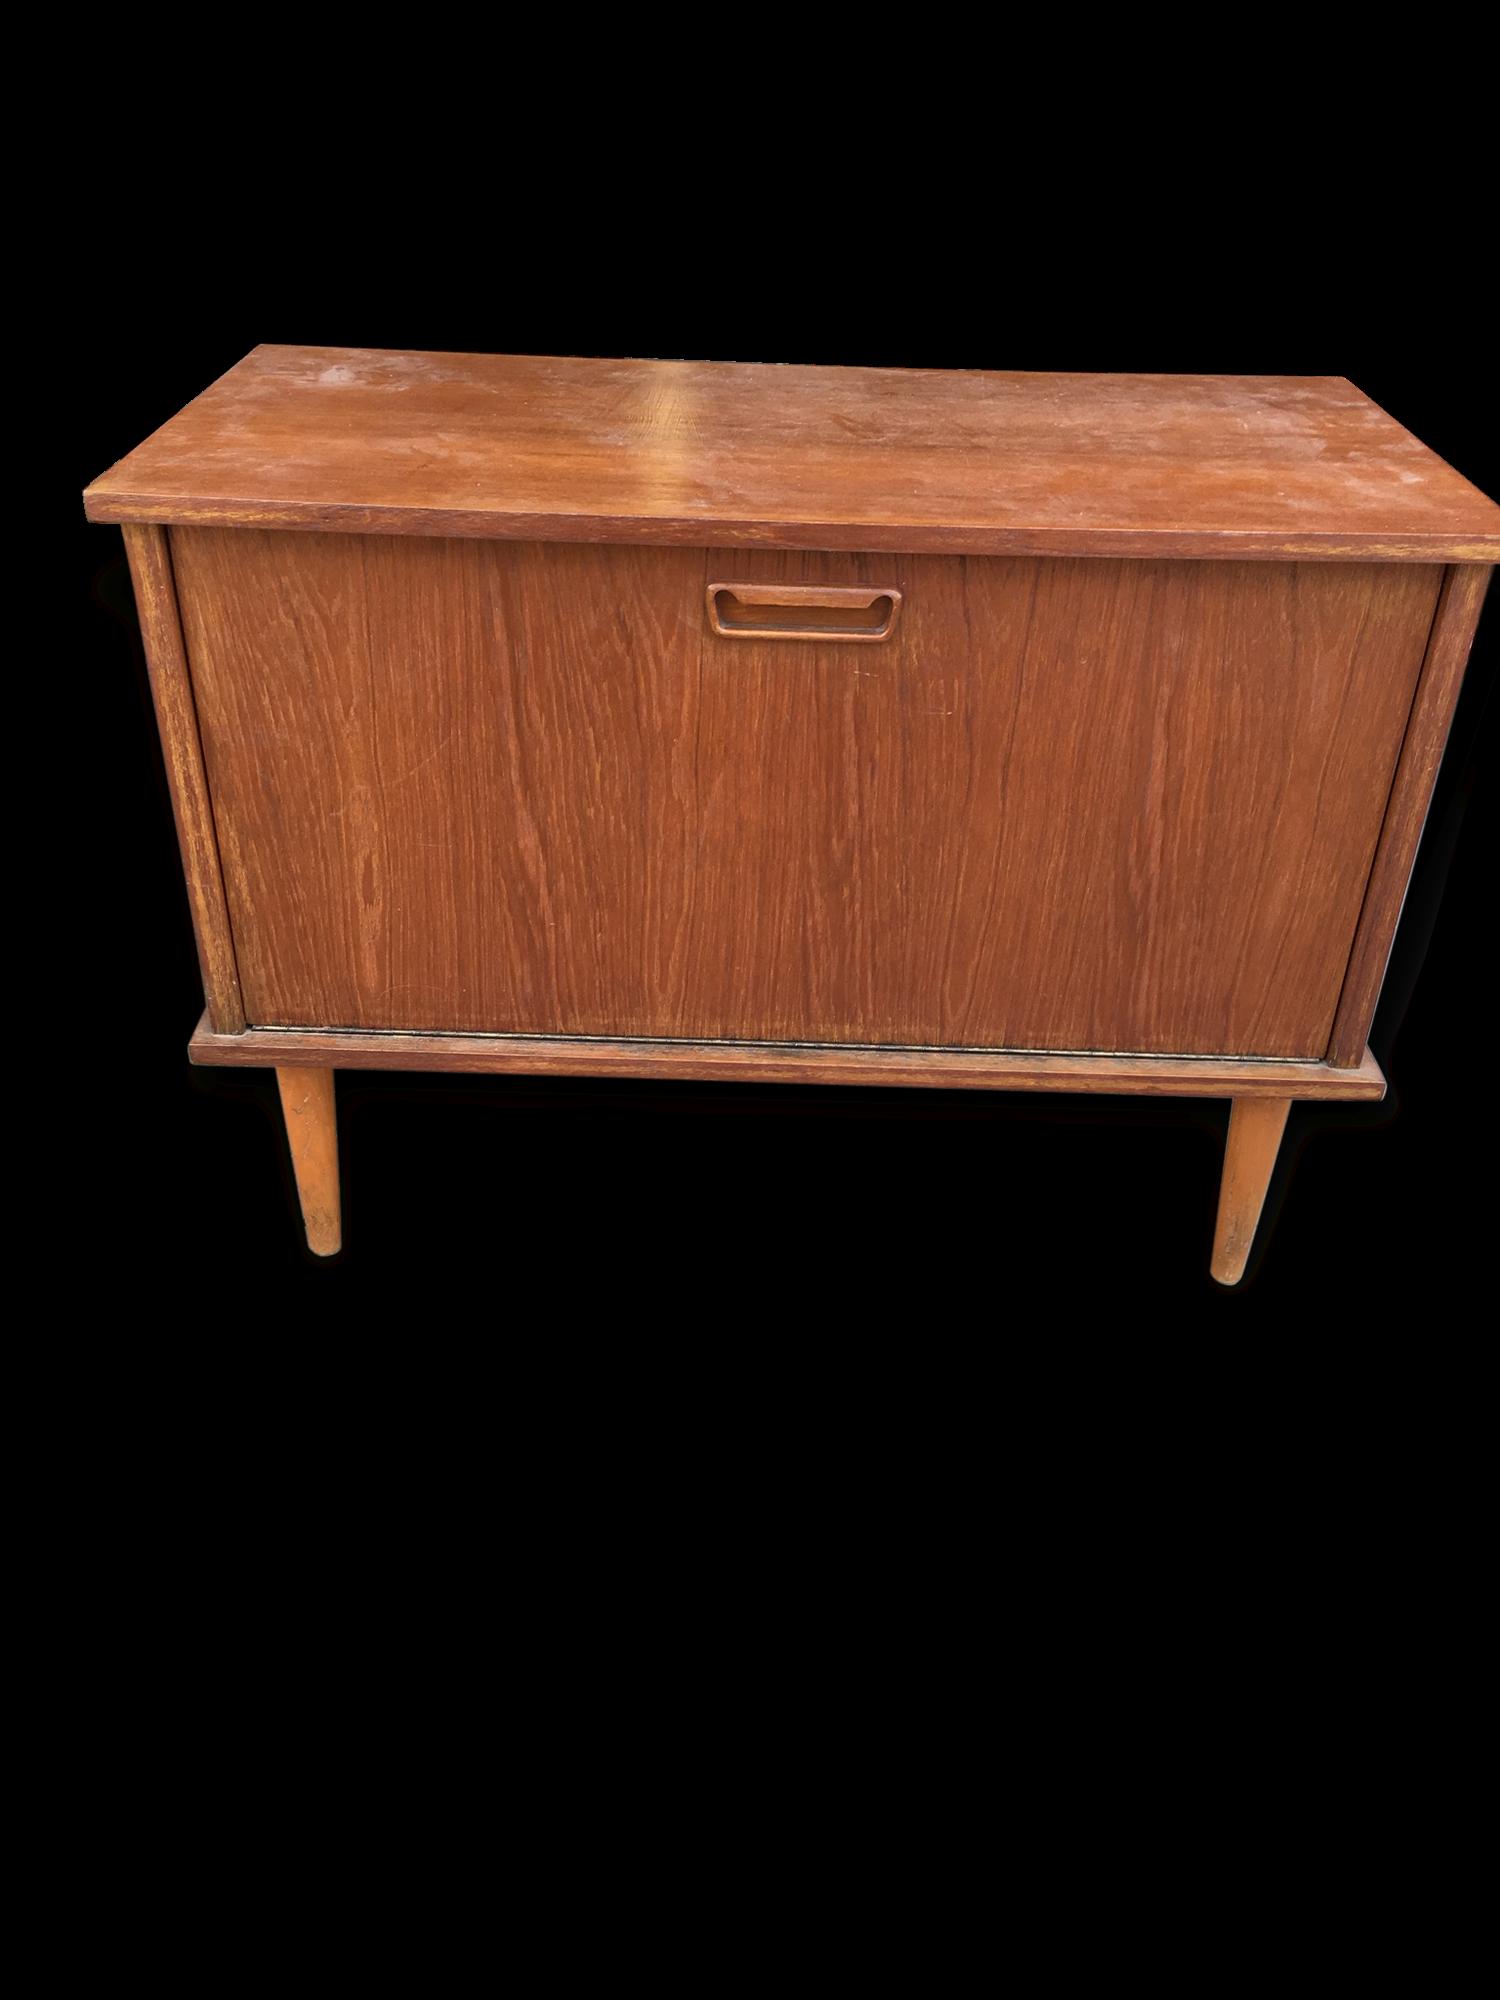 meuble bar original cool meuble bar design original en bois laqu en cuivre equator boca do lobo. Black Bedroom Furniture Sets. Home Design Ideas